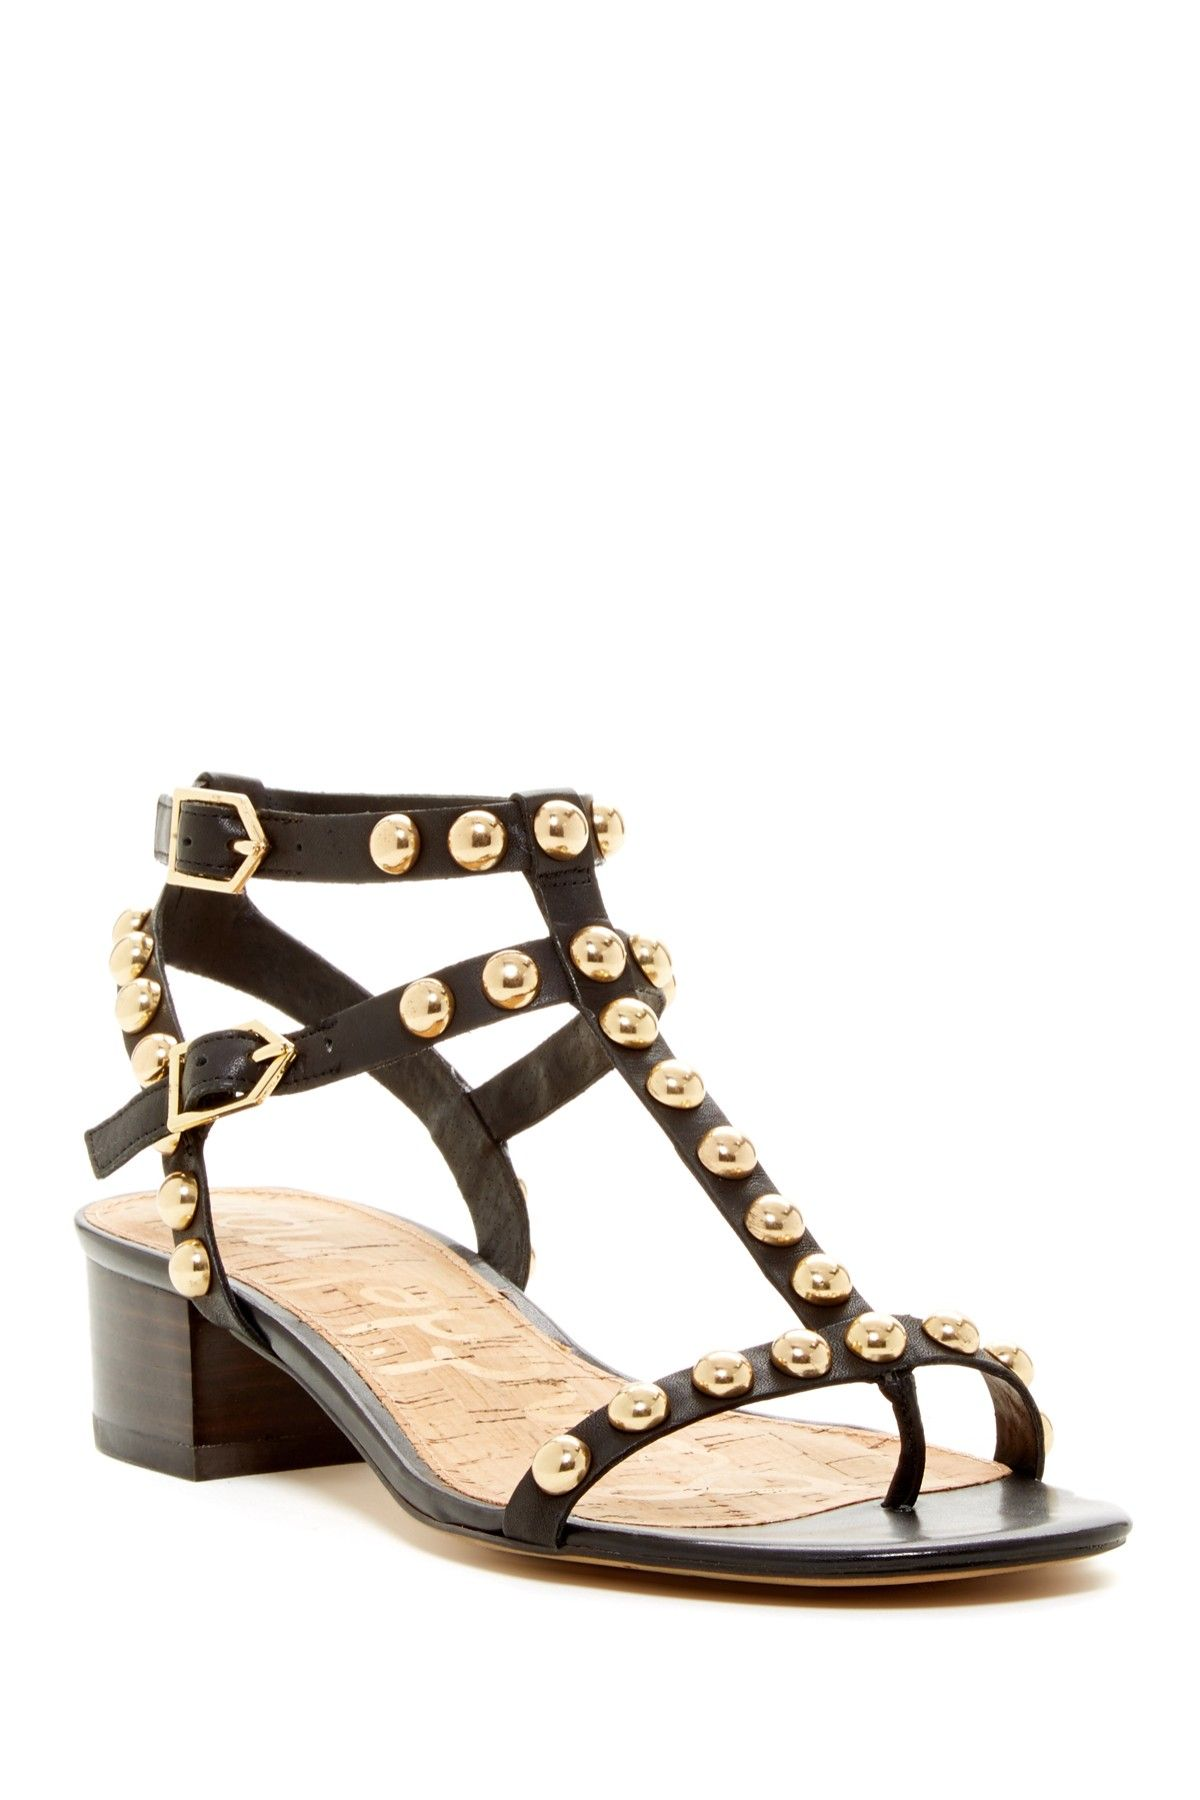 eaa2f1e90 Asbury Studded Block Heel Sandal by Sam Edelman on  nordstrom rack